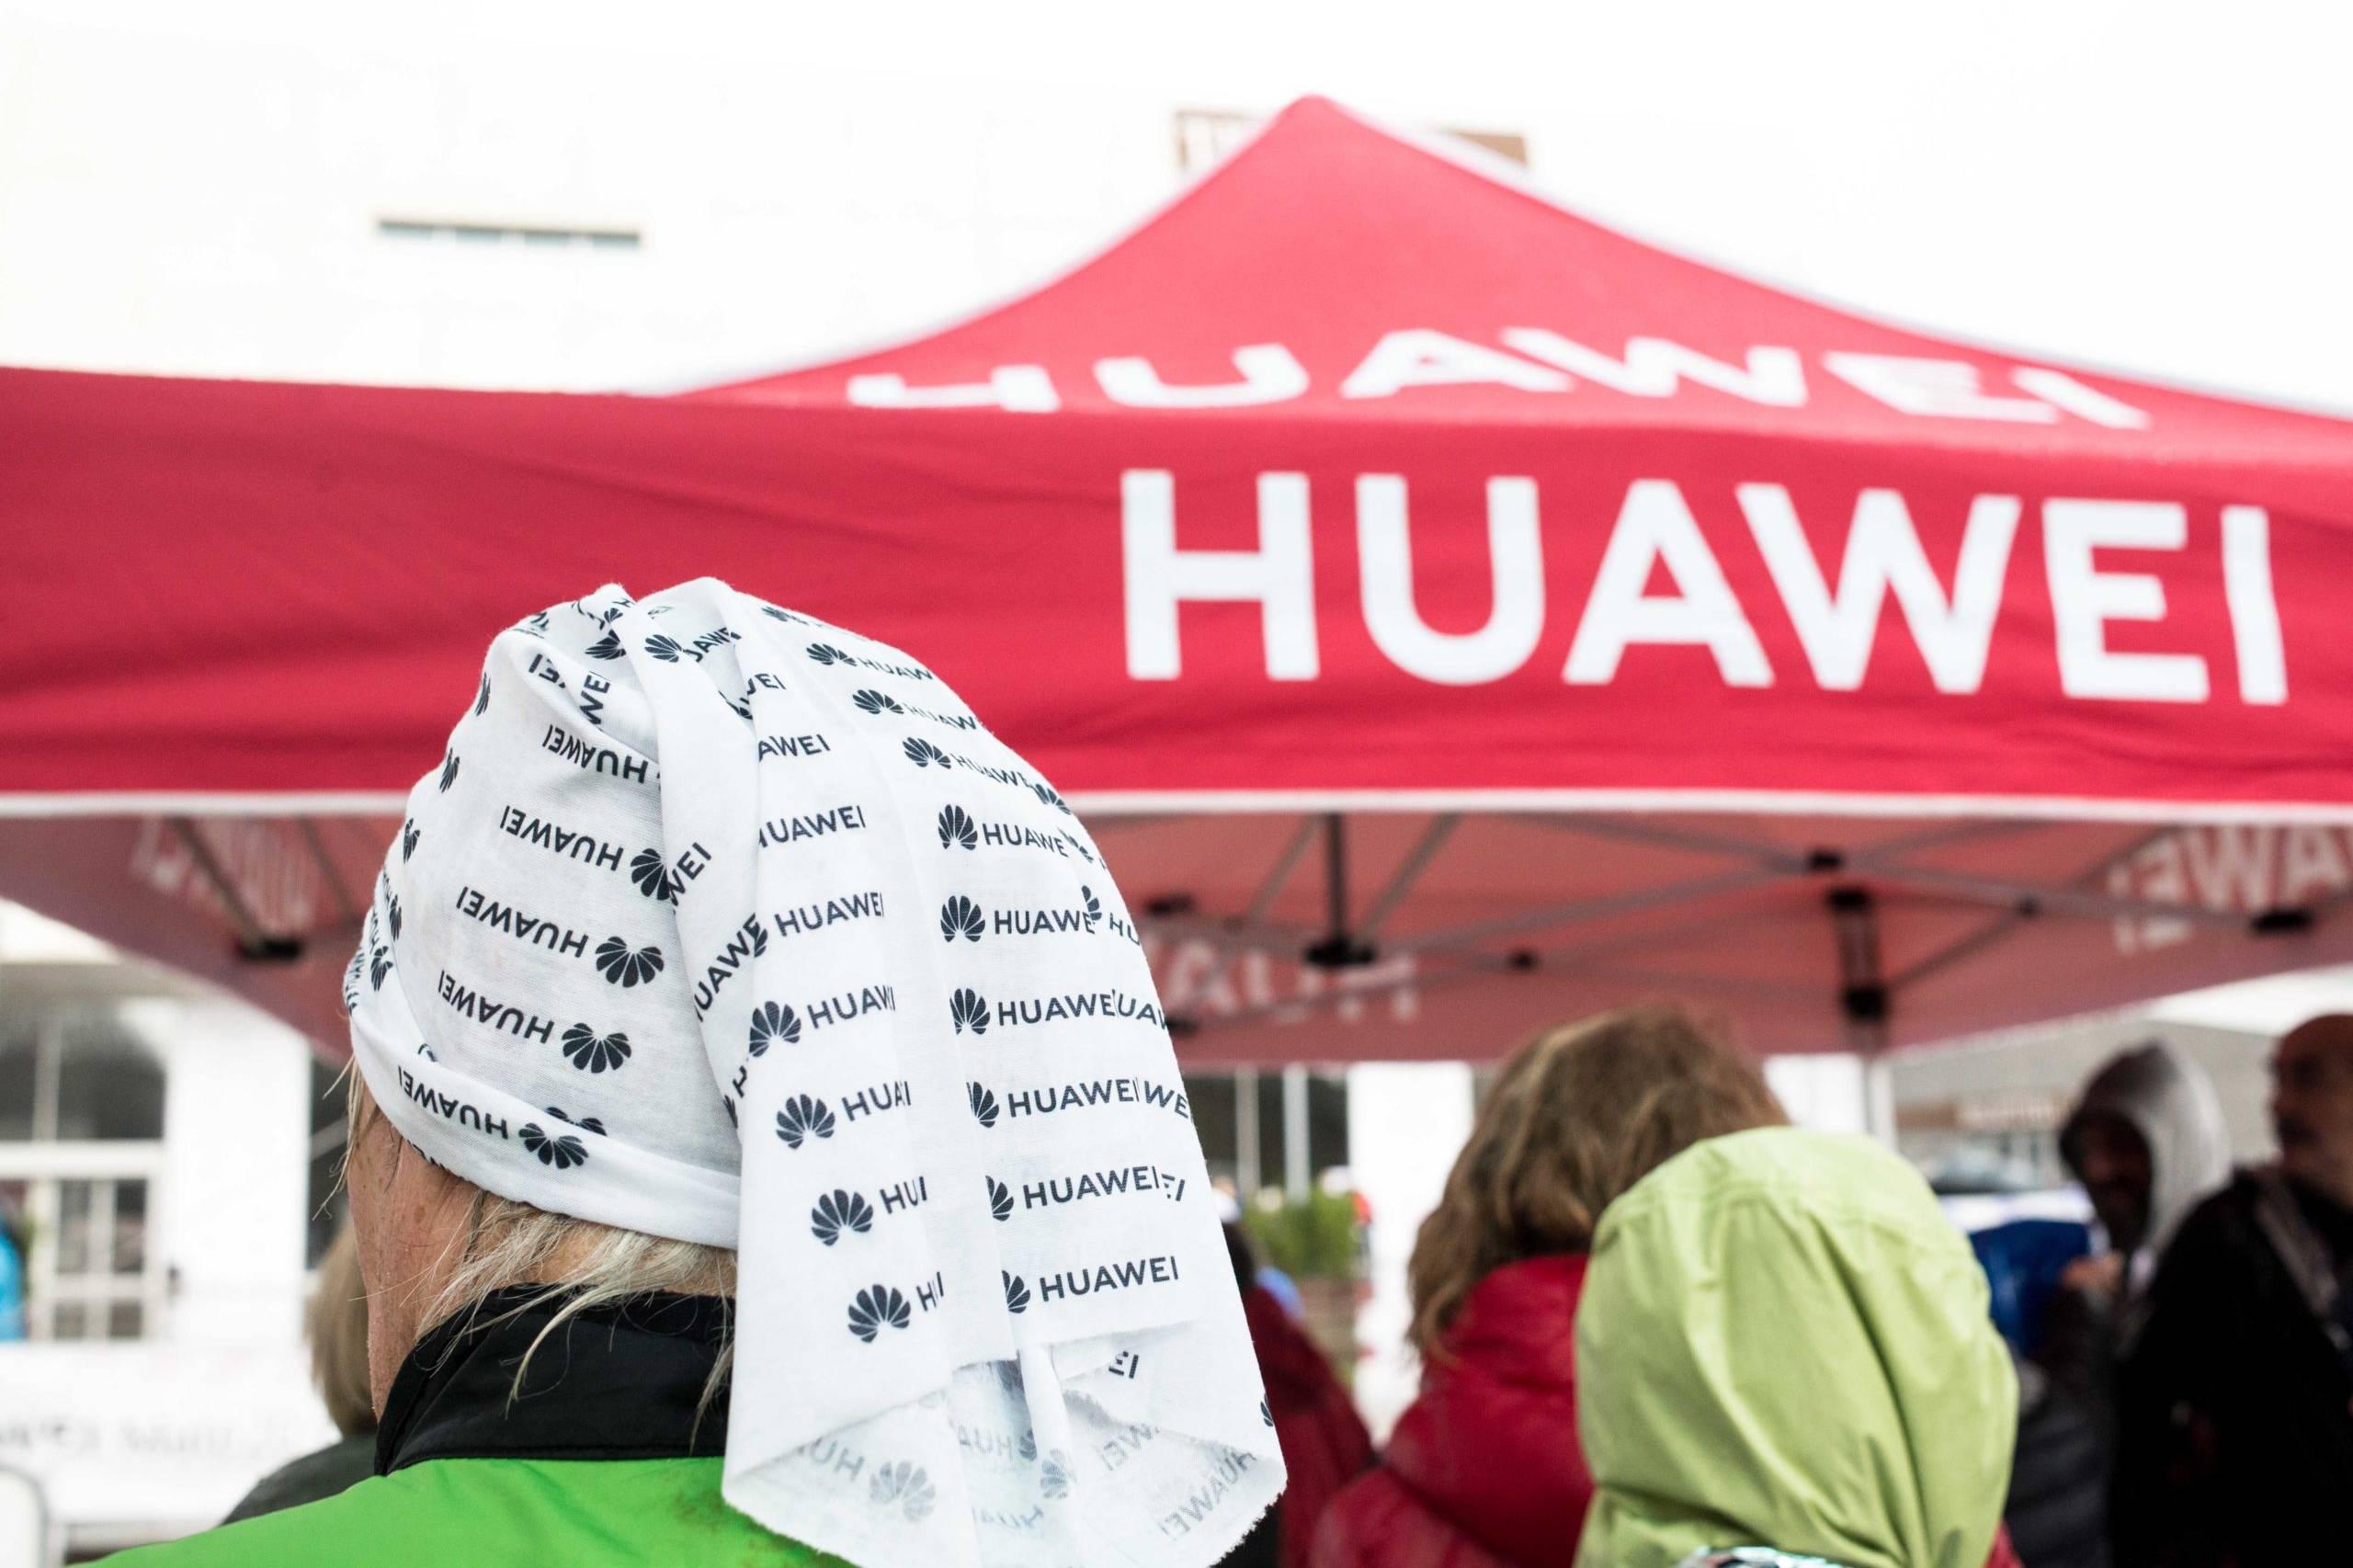 Huawei Sponsor Huawei Marathons